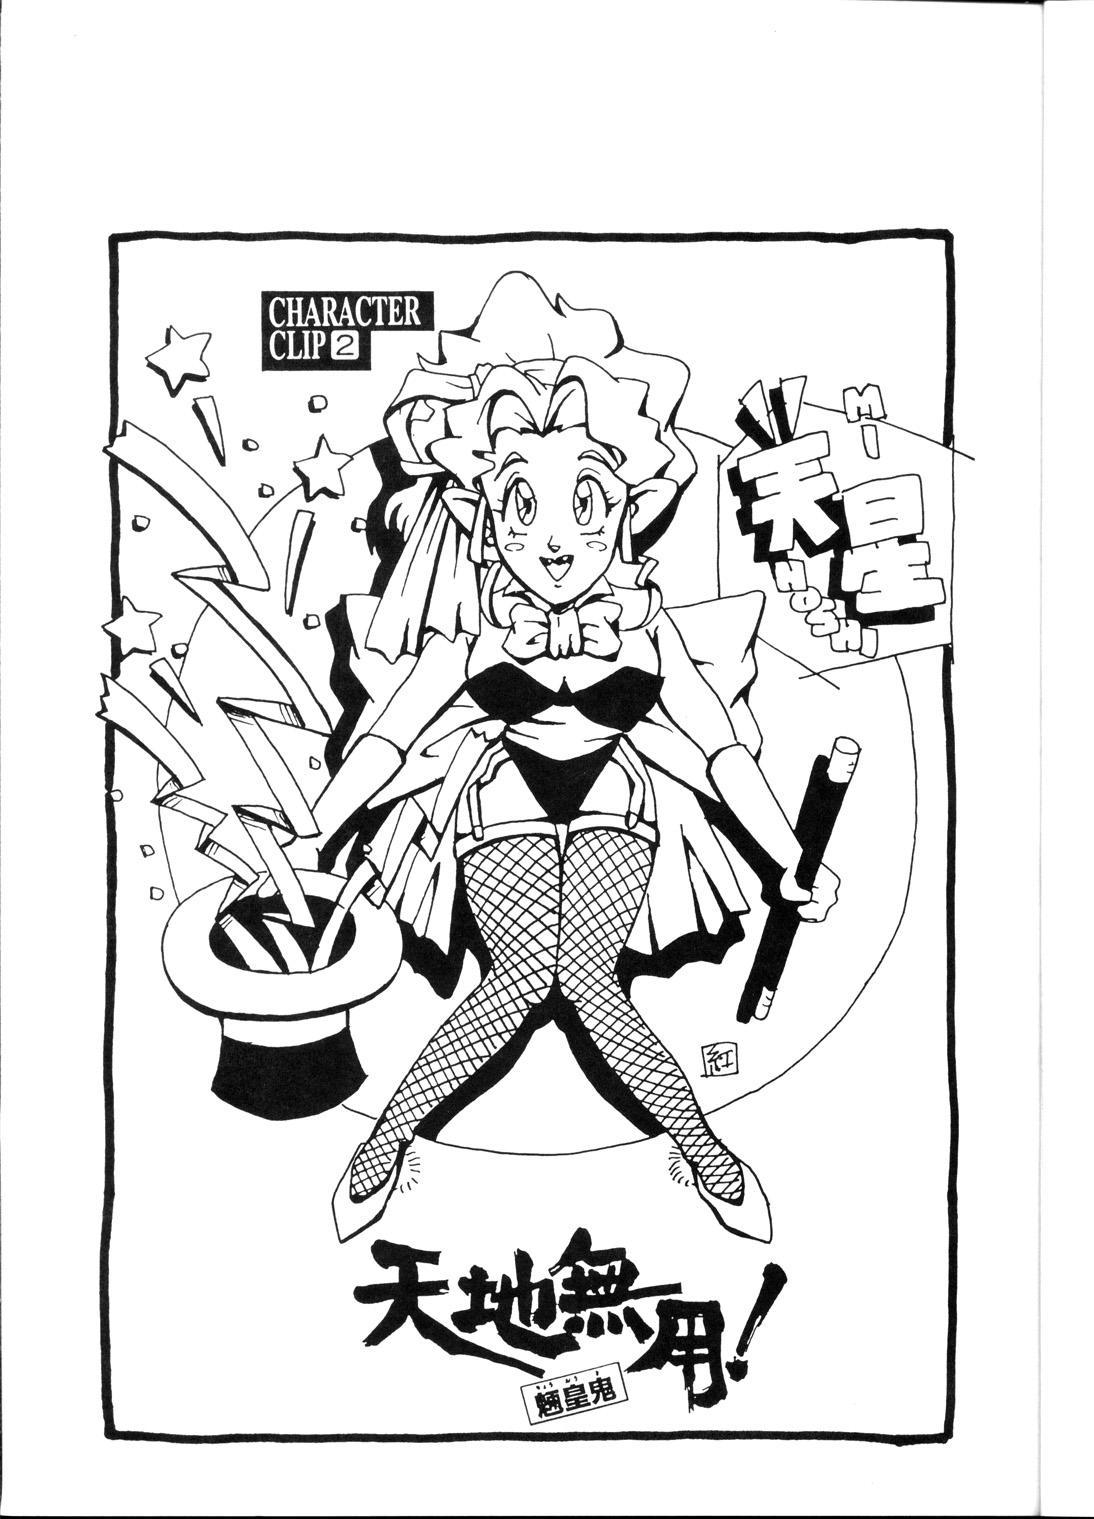 [B.B.C] Tenchi Muyou! Ryou-ou-ki Kaiteiben (Tenchi Muyou!) 5